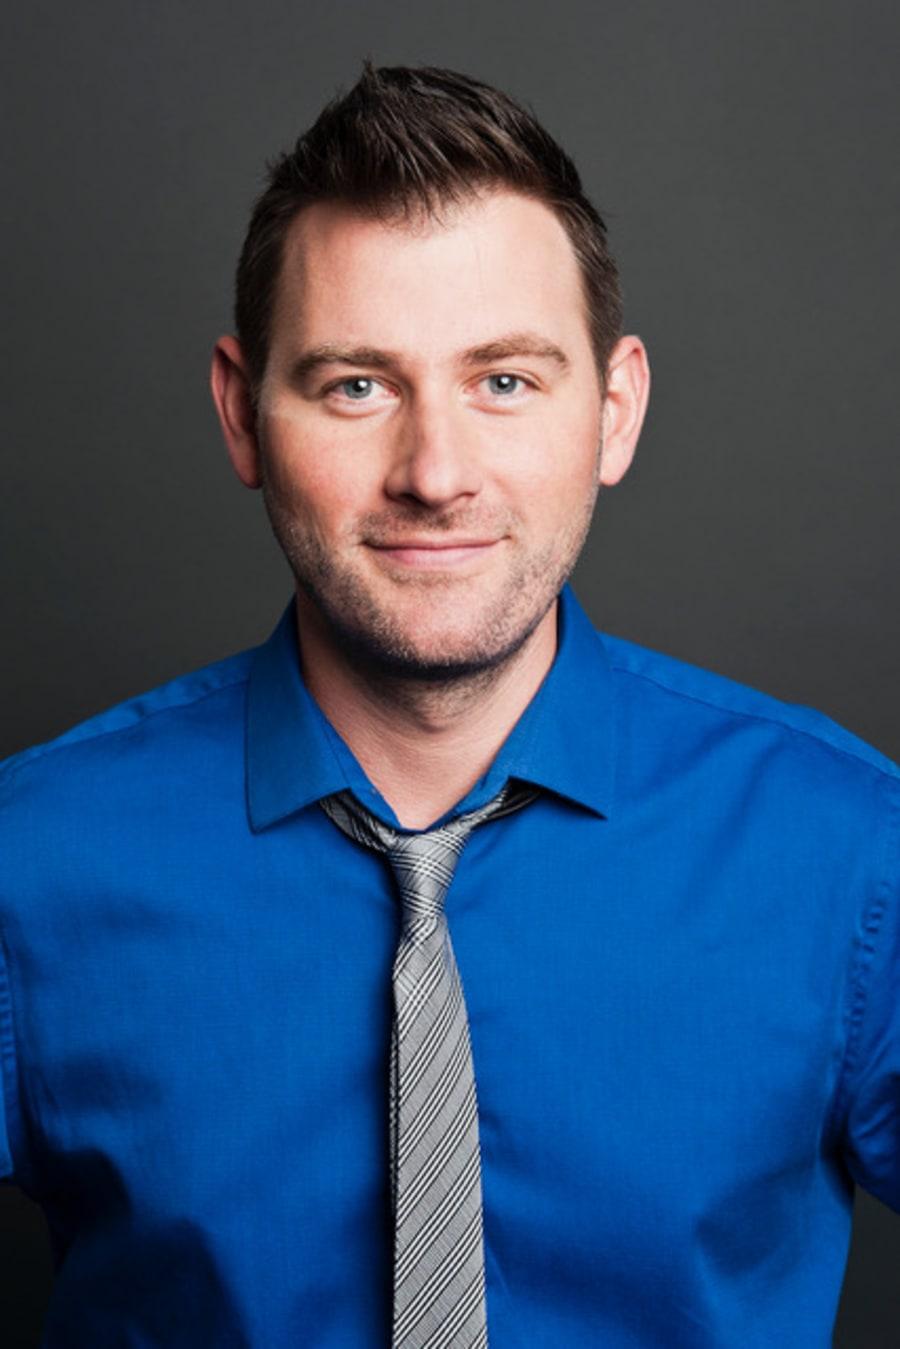 Josh Zepps John Howard Impressions Fake News And Making It